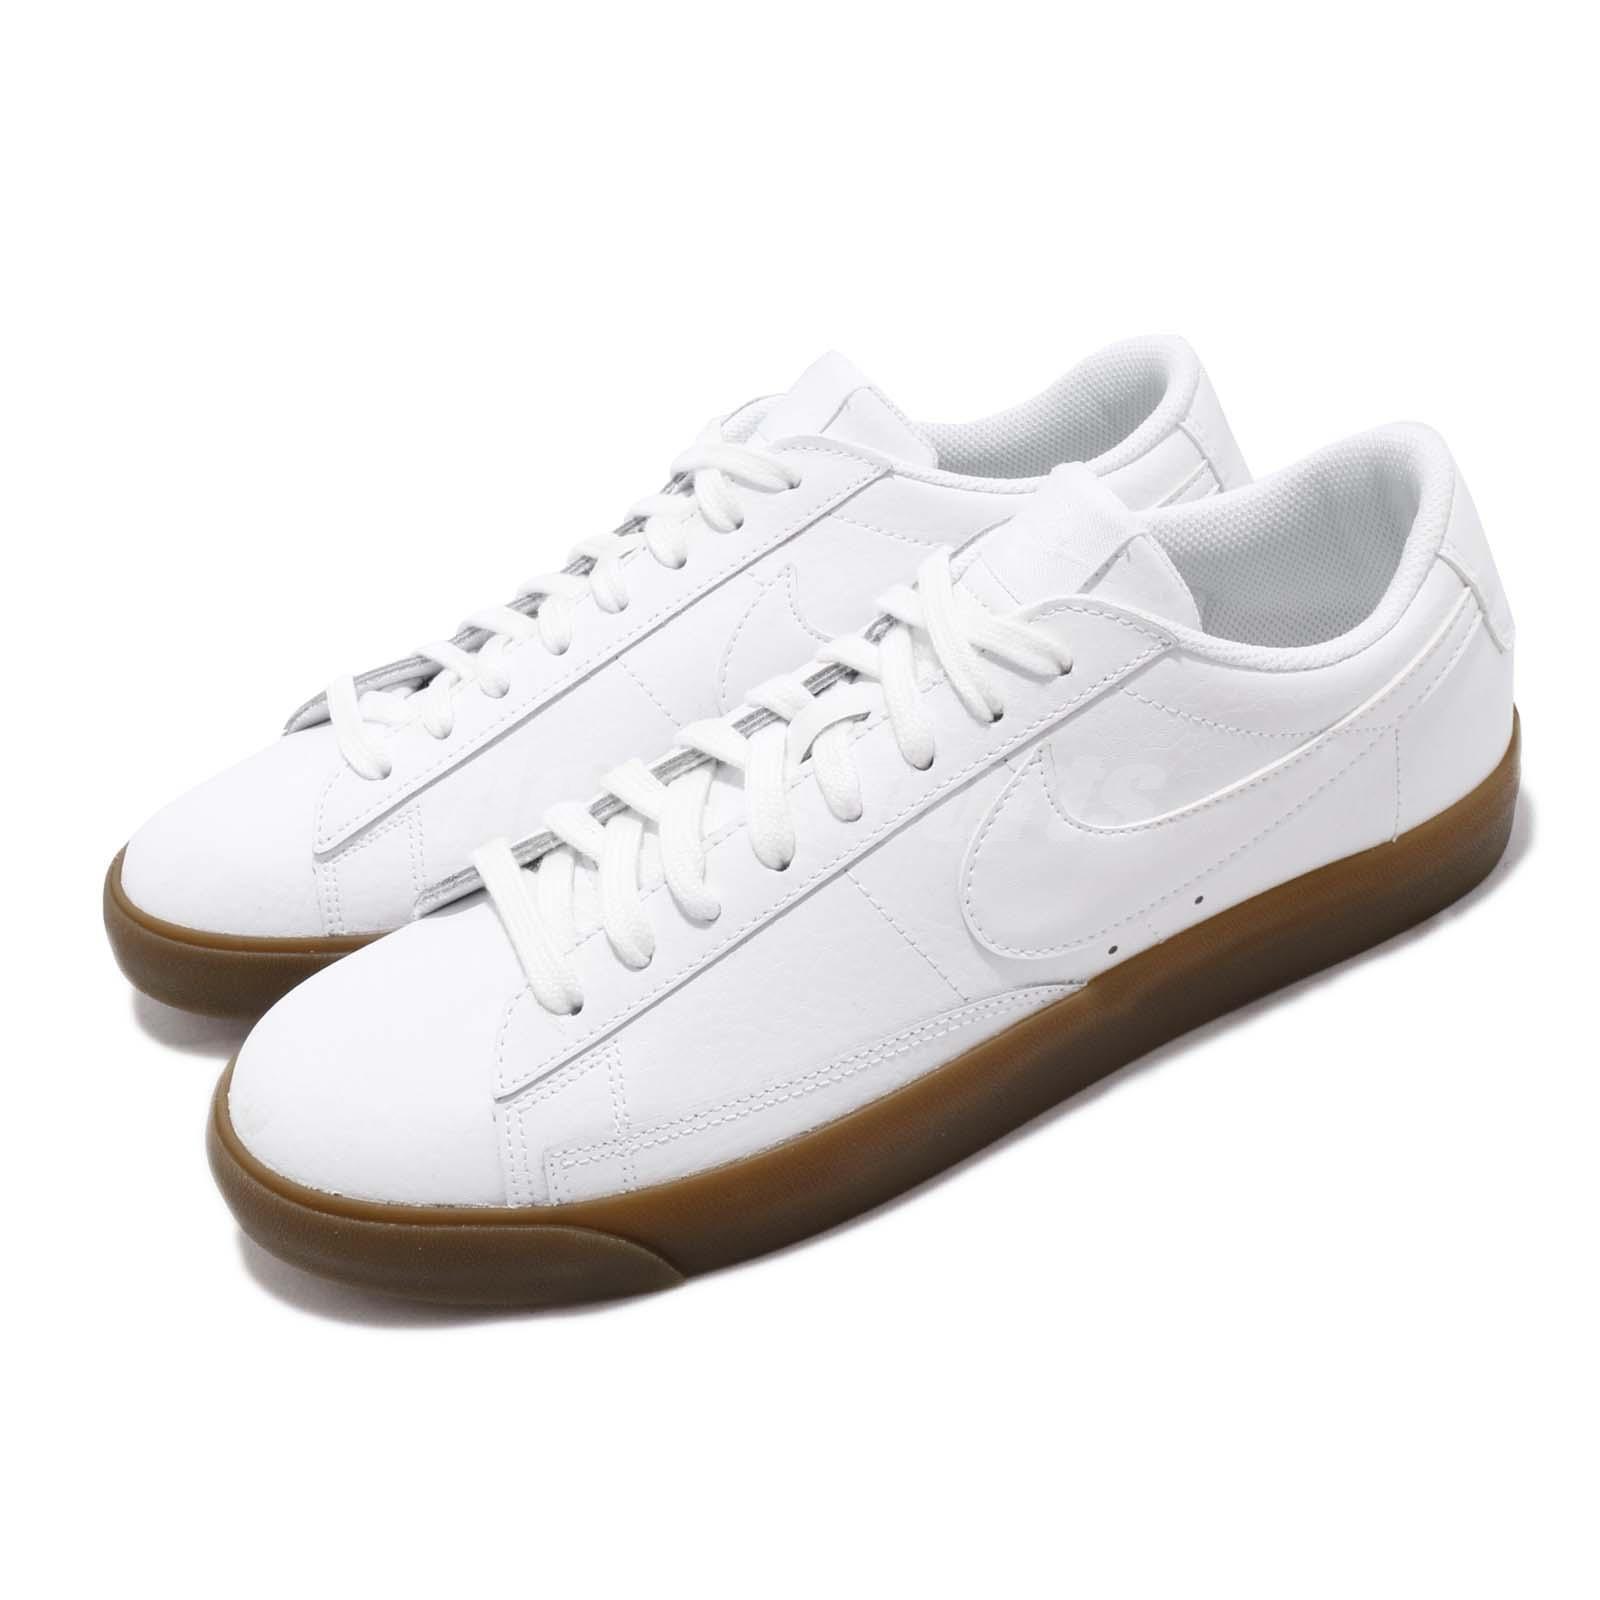 Nike Blazer Low LE White Gum Men Casual Lifestyle shoes Sneakers AQ3597-102